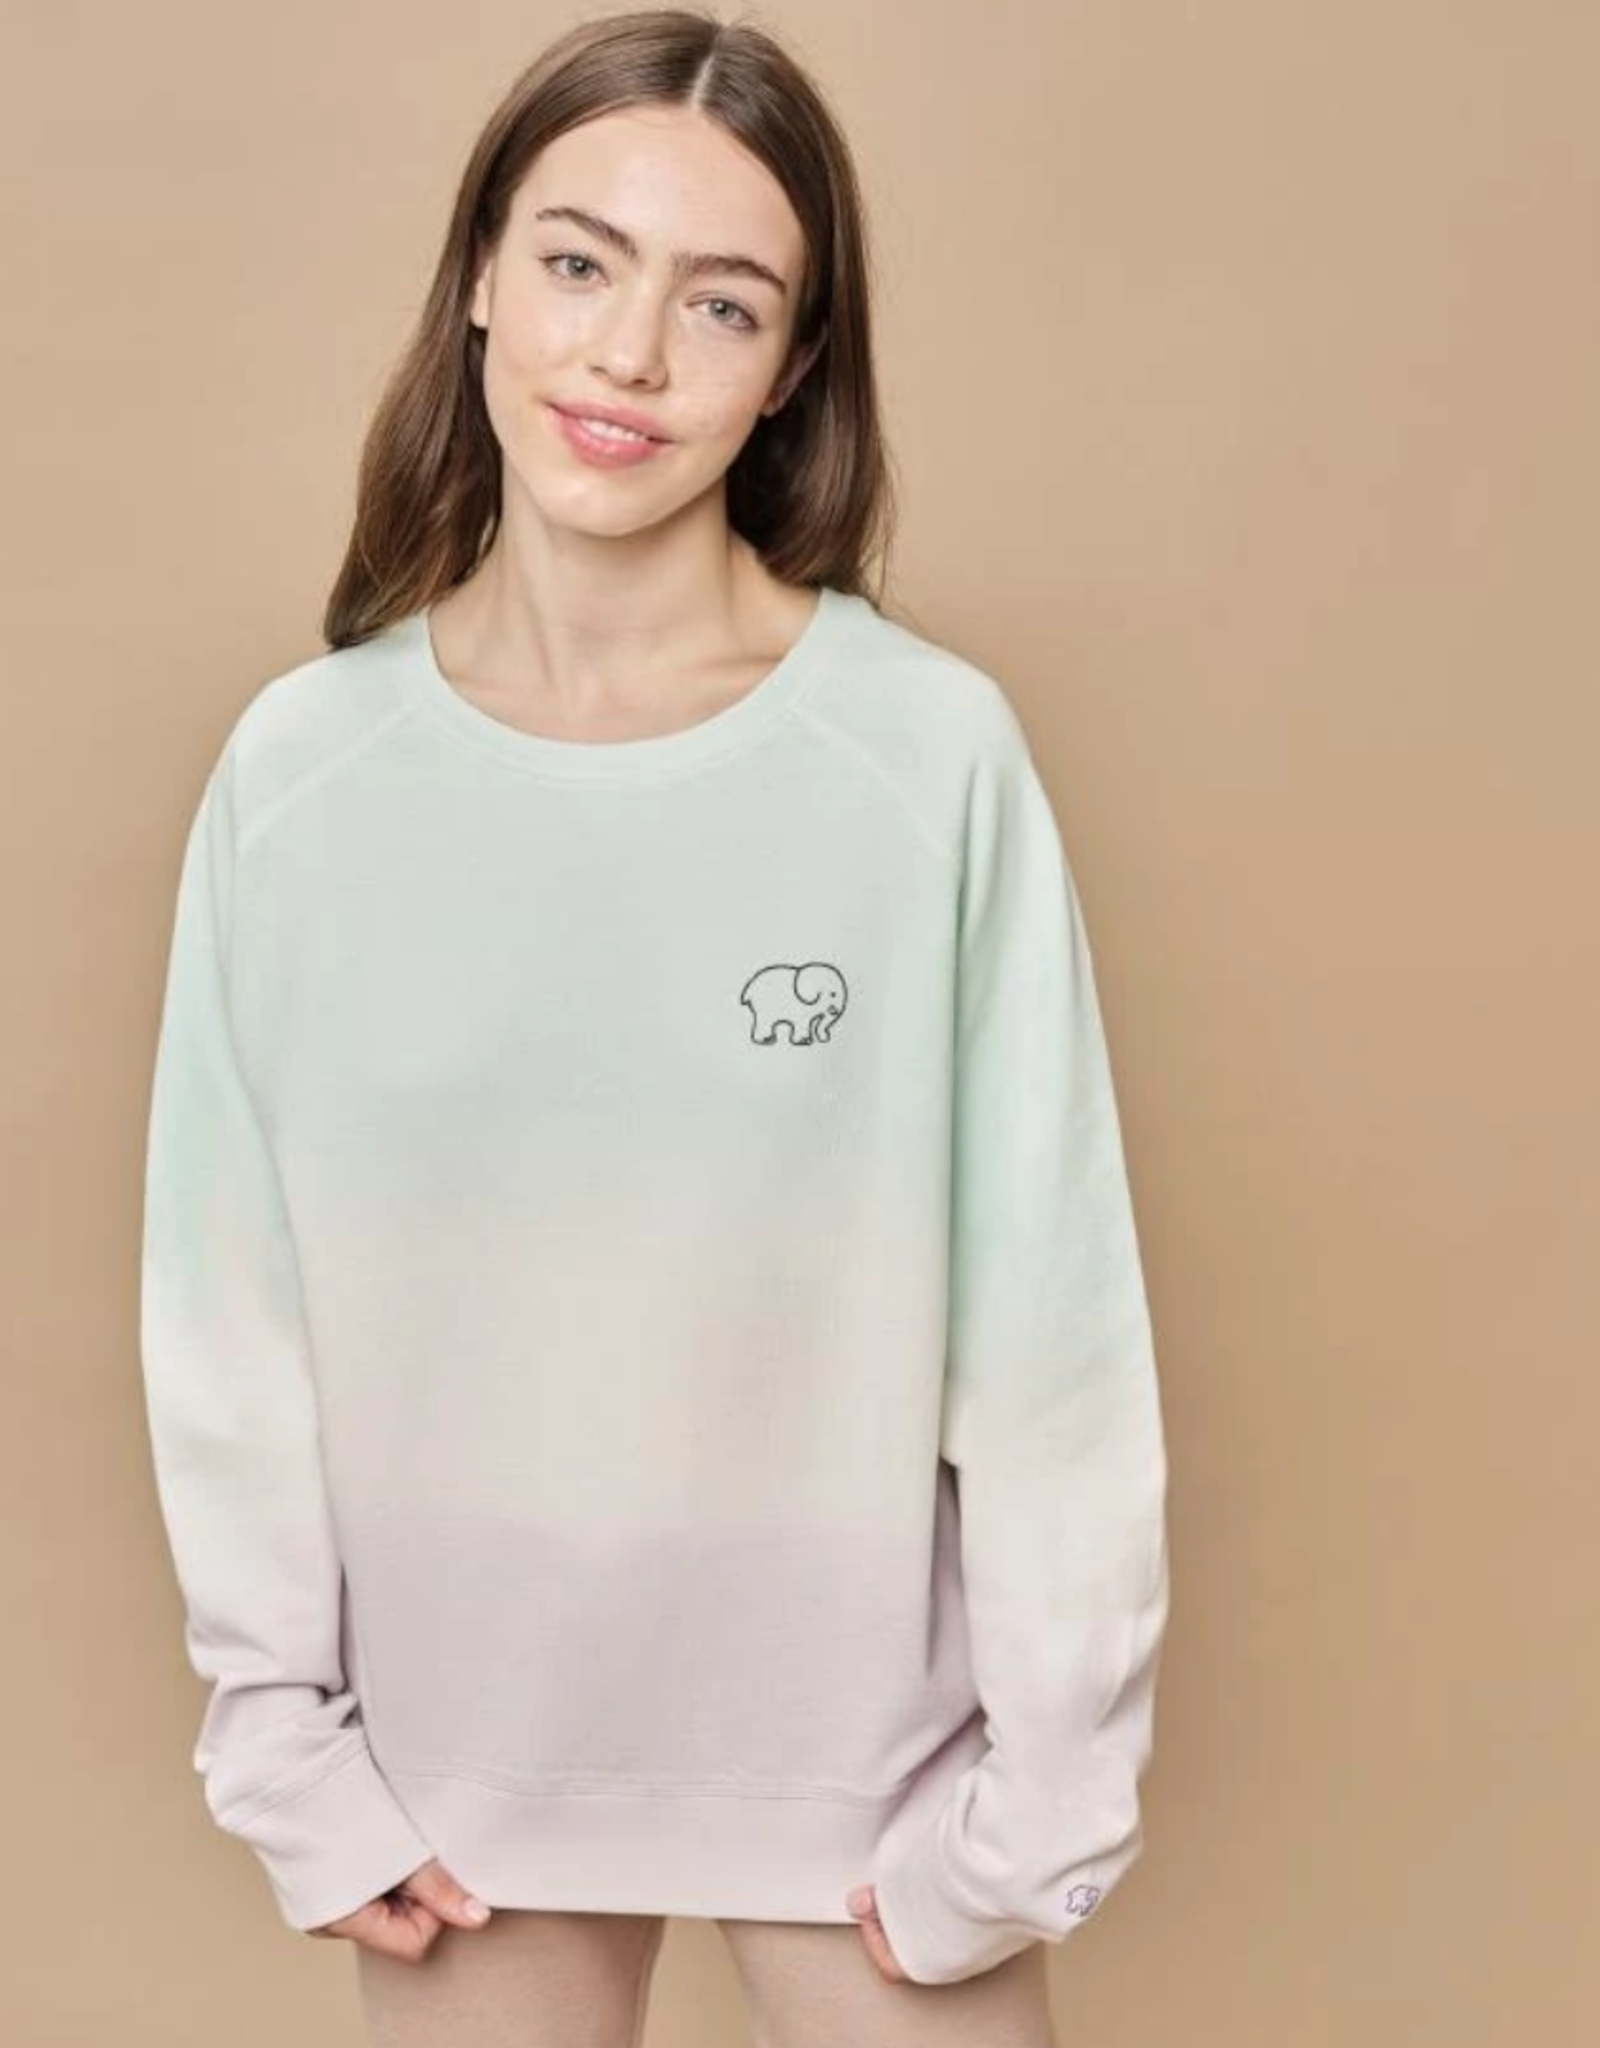 Ivory Ella Ivory Ella - Alissa Dip Dye Sweatshirt